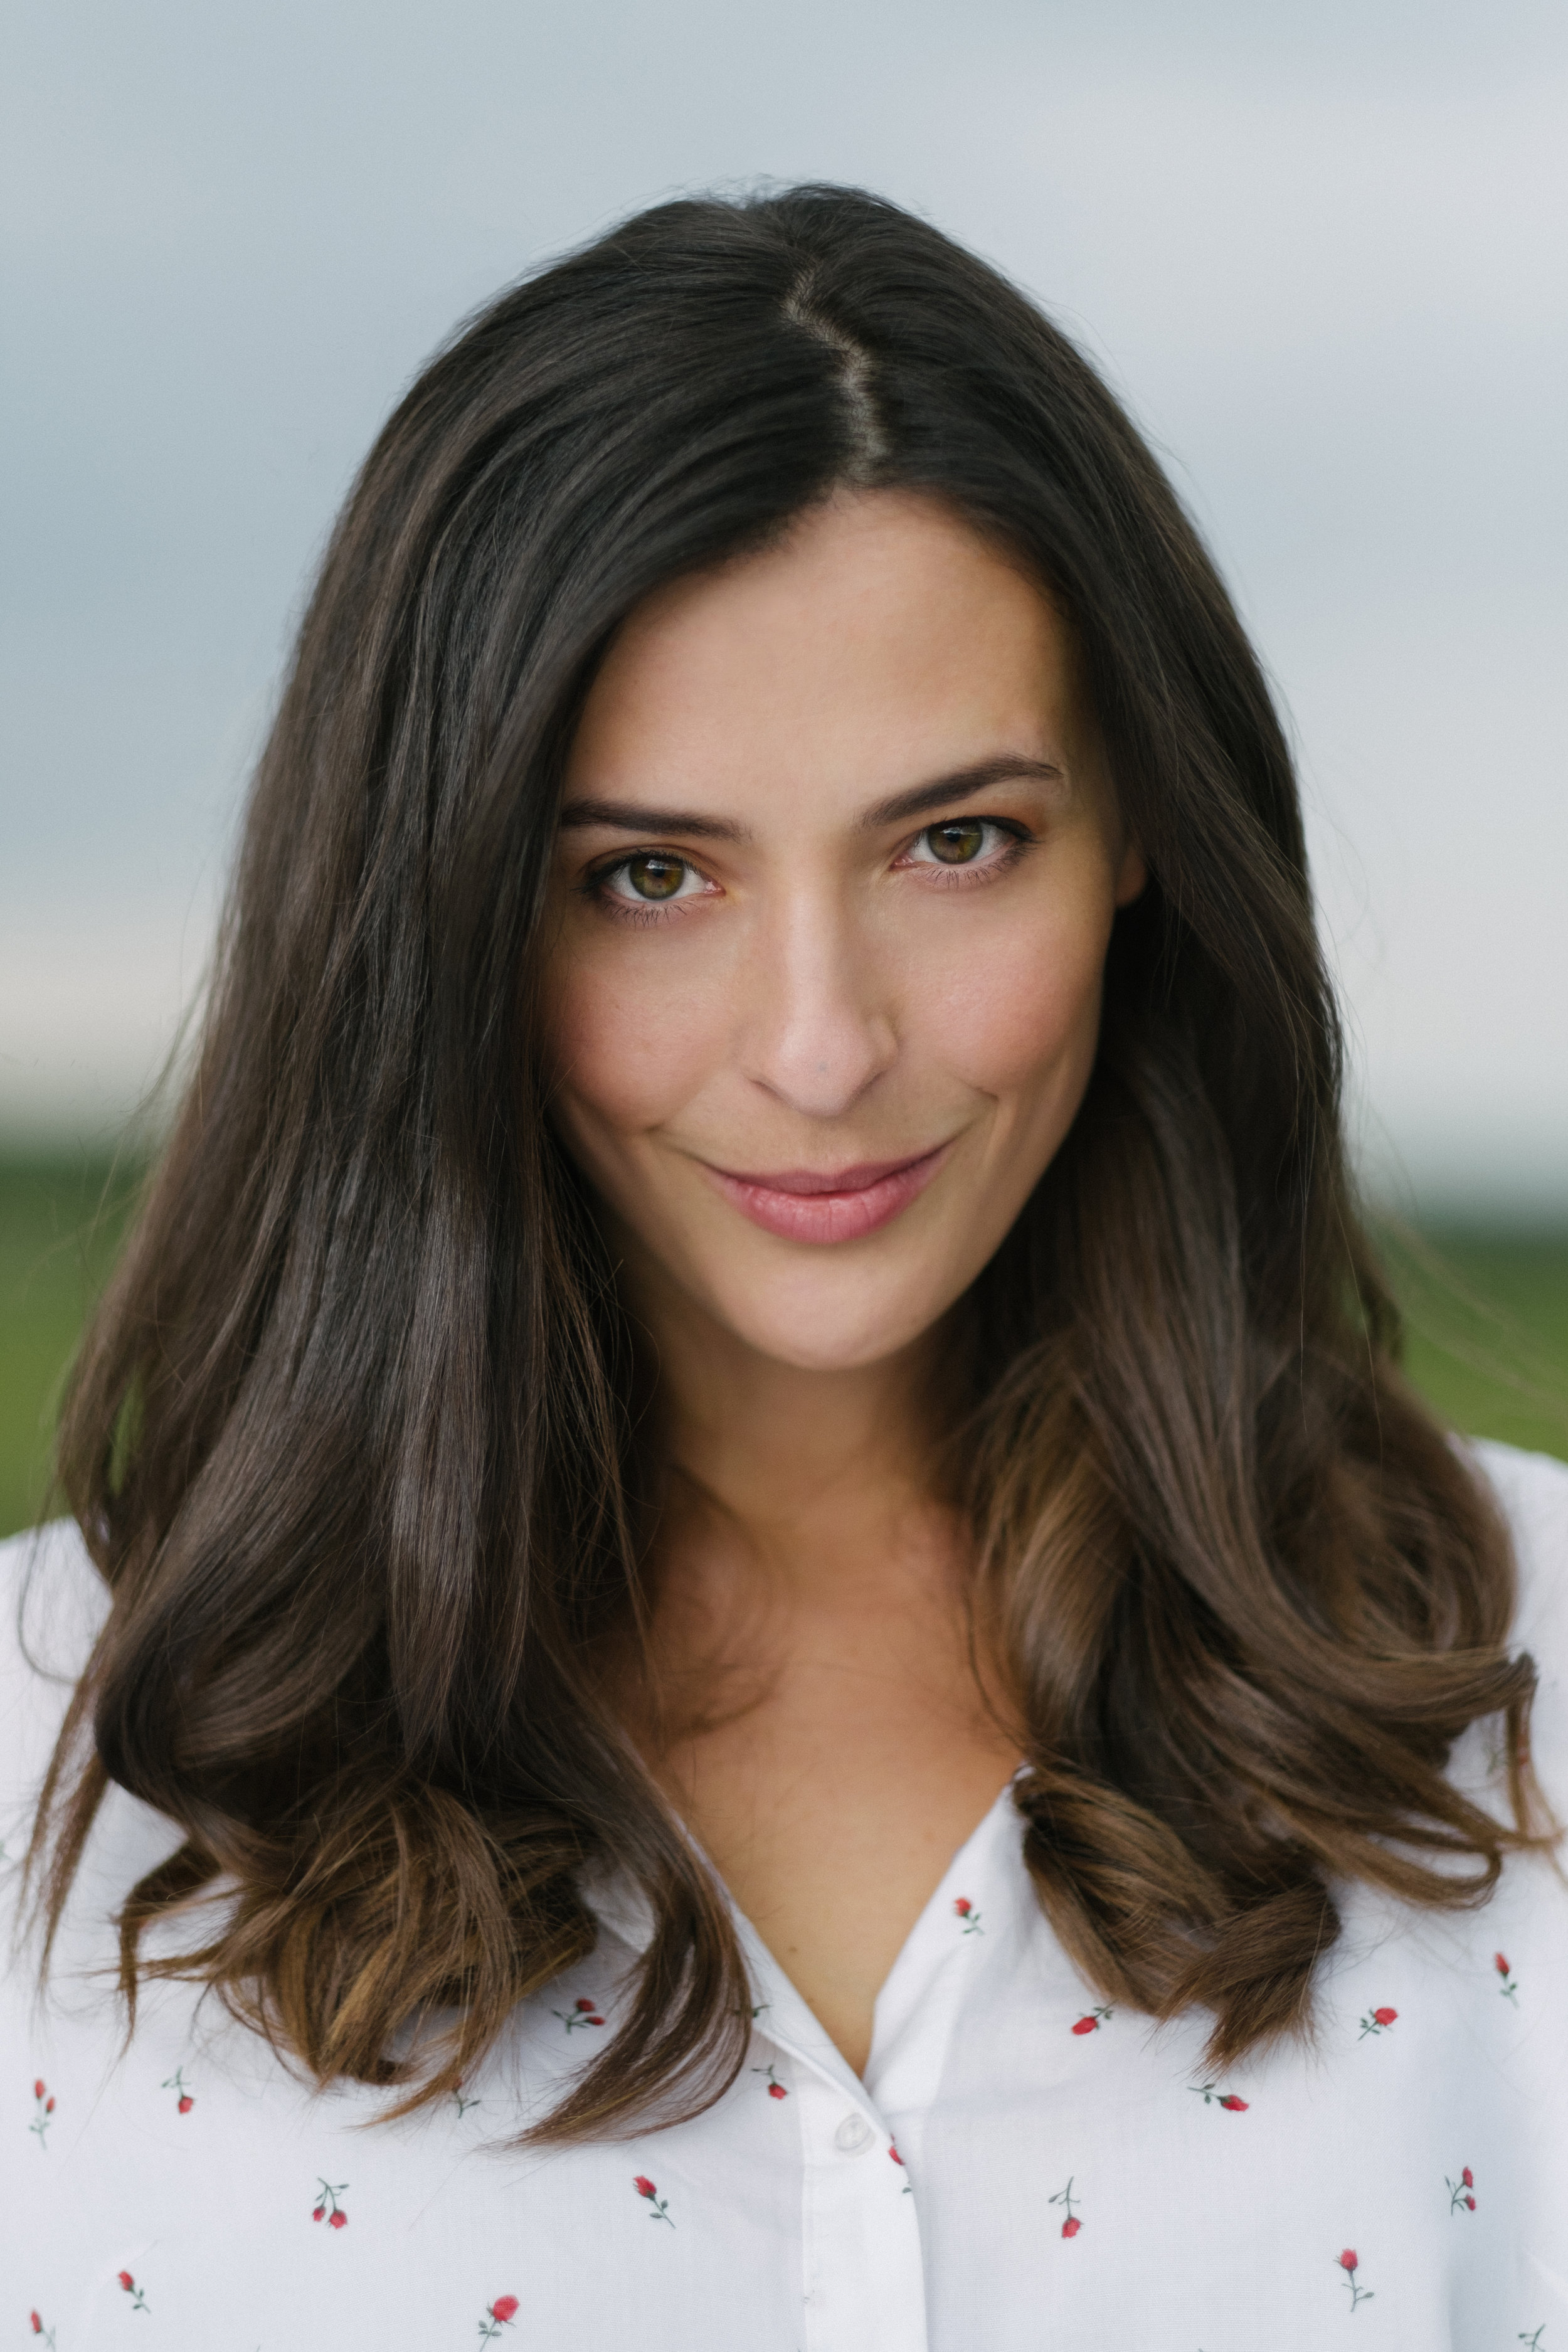 Rebecca Van Cleave